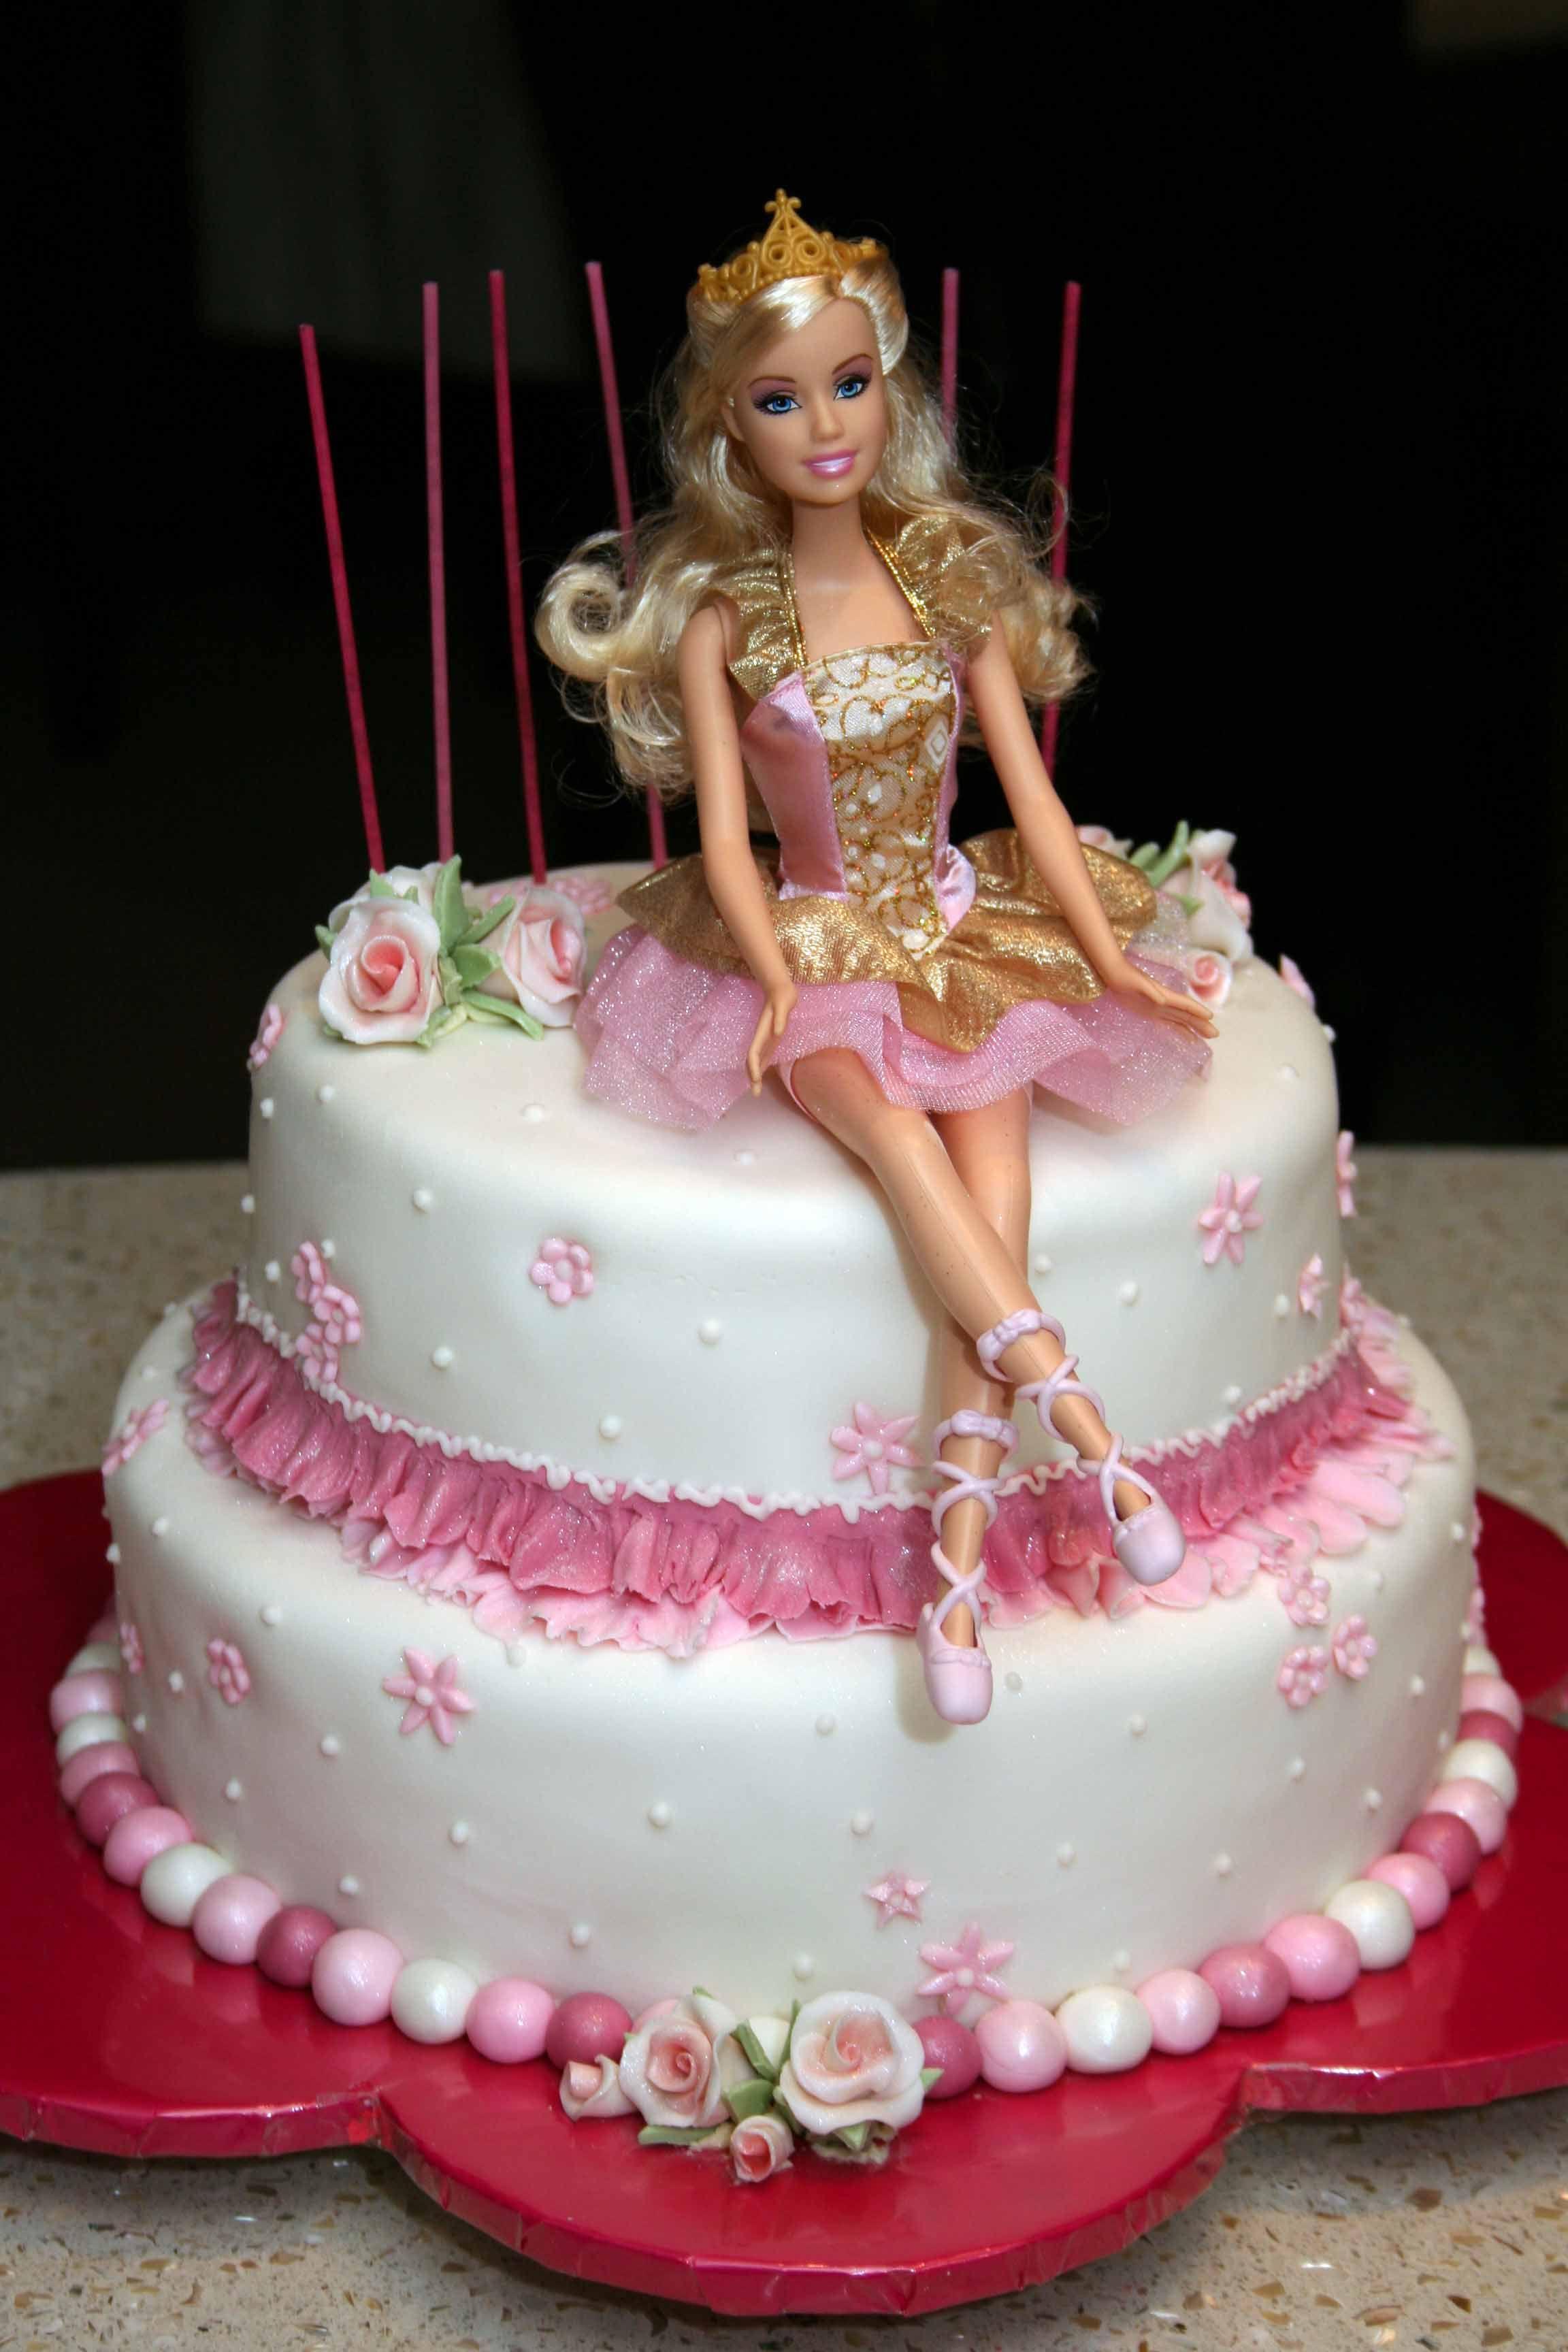 Strange Barbie Ballet Cake Barbie Cake Designs Barbie Birthday Cake Funny Birthday Cards Online Alyptdamsfinfo